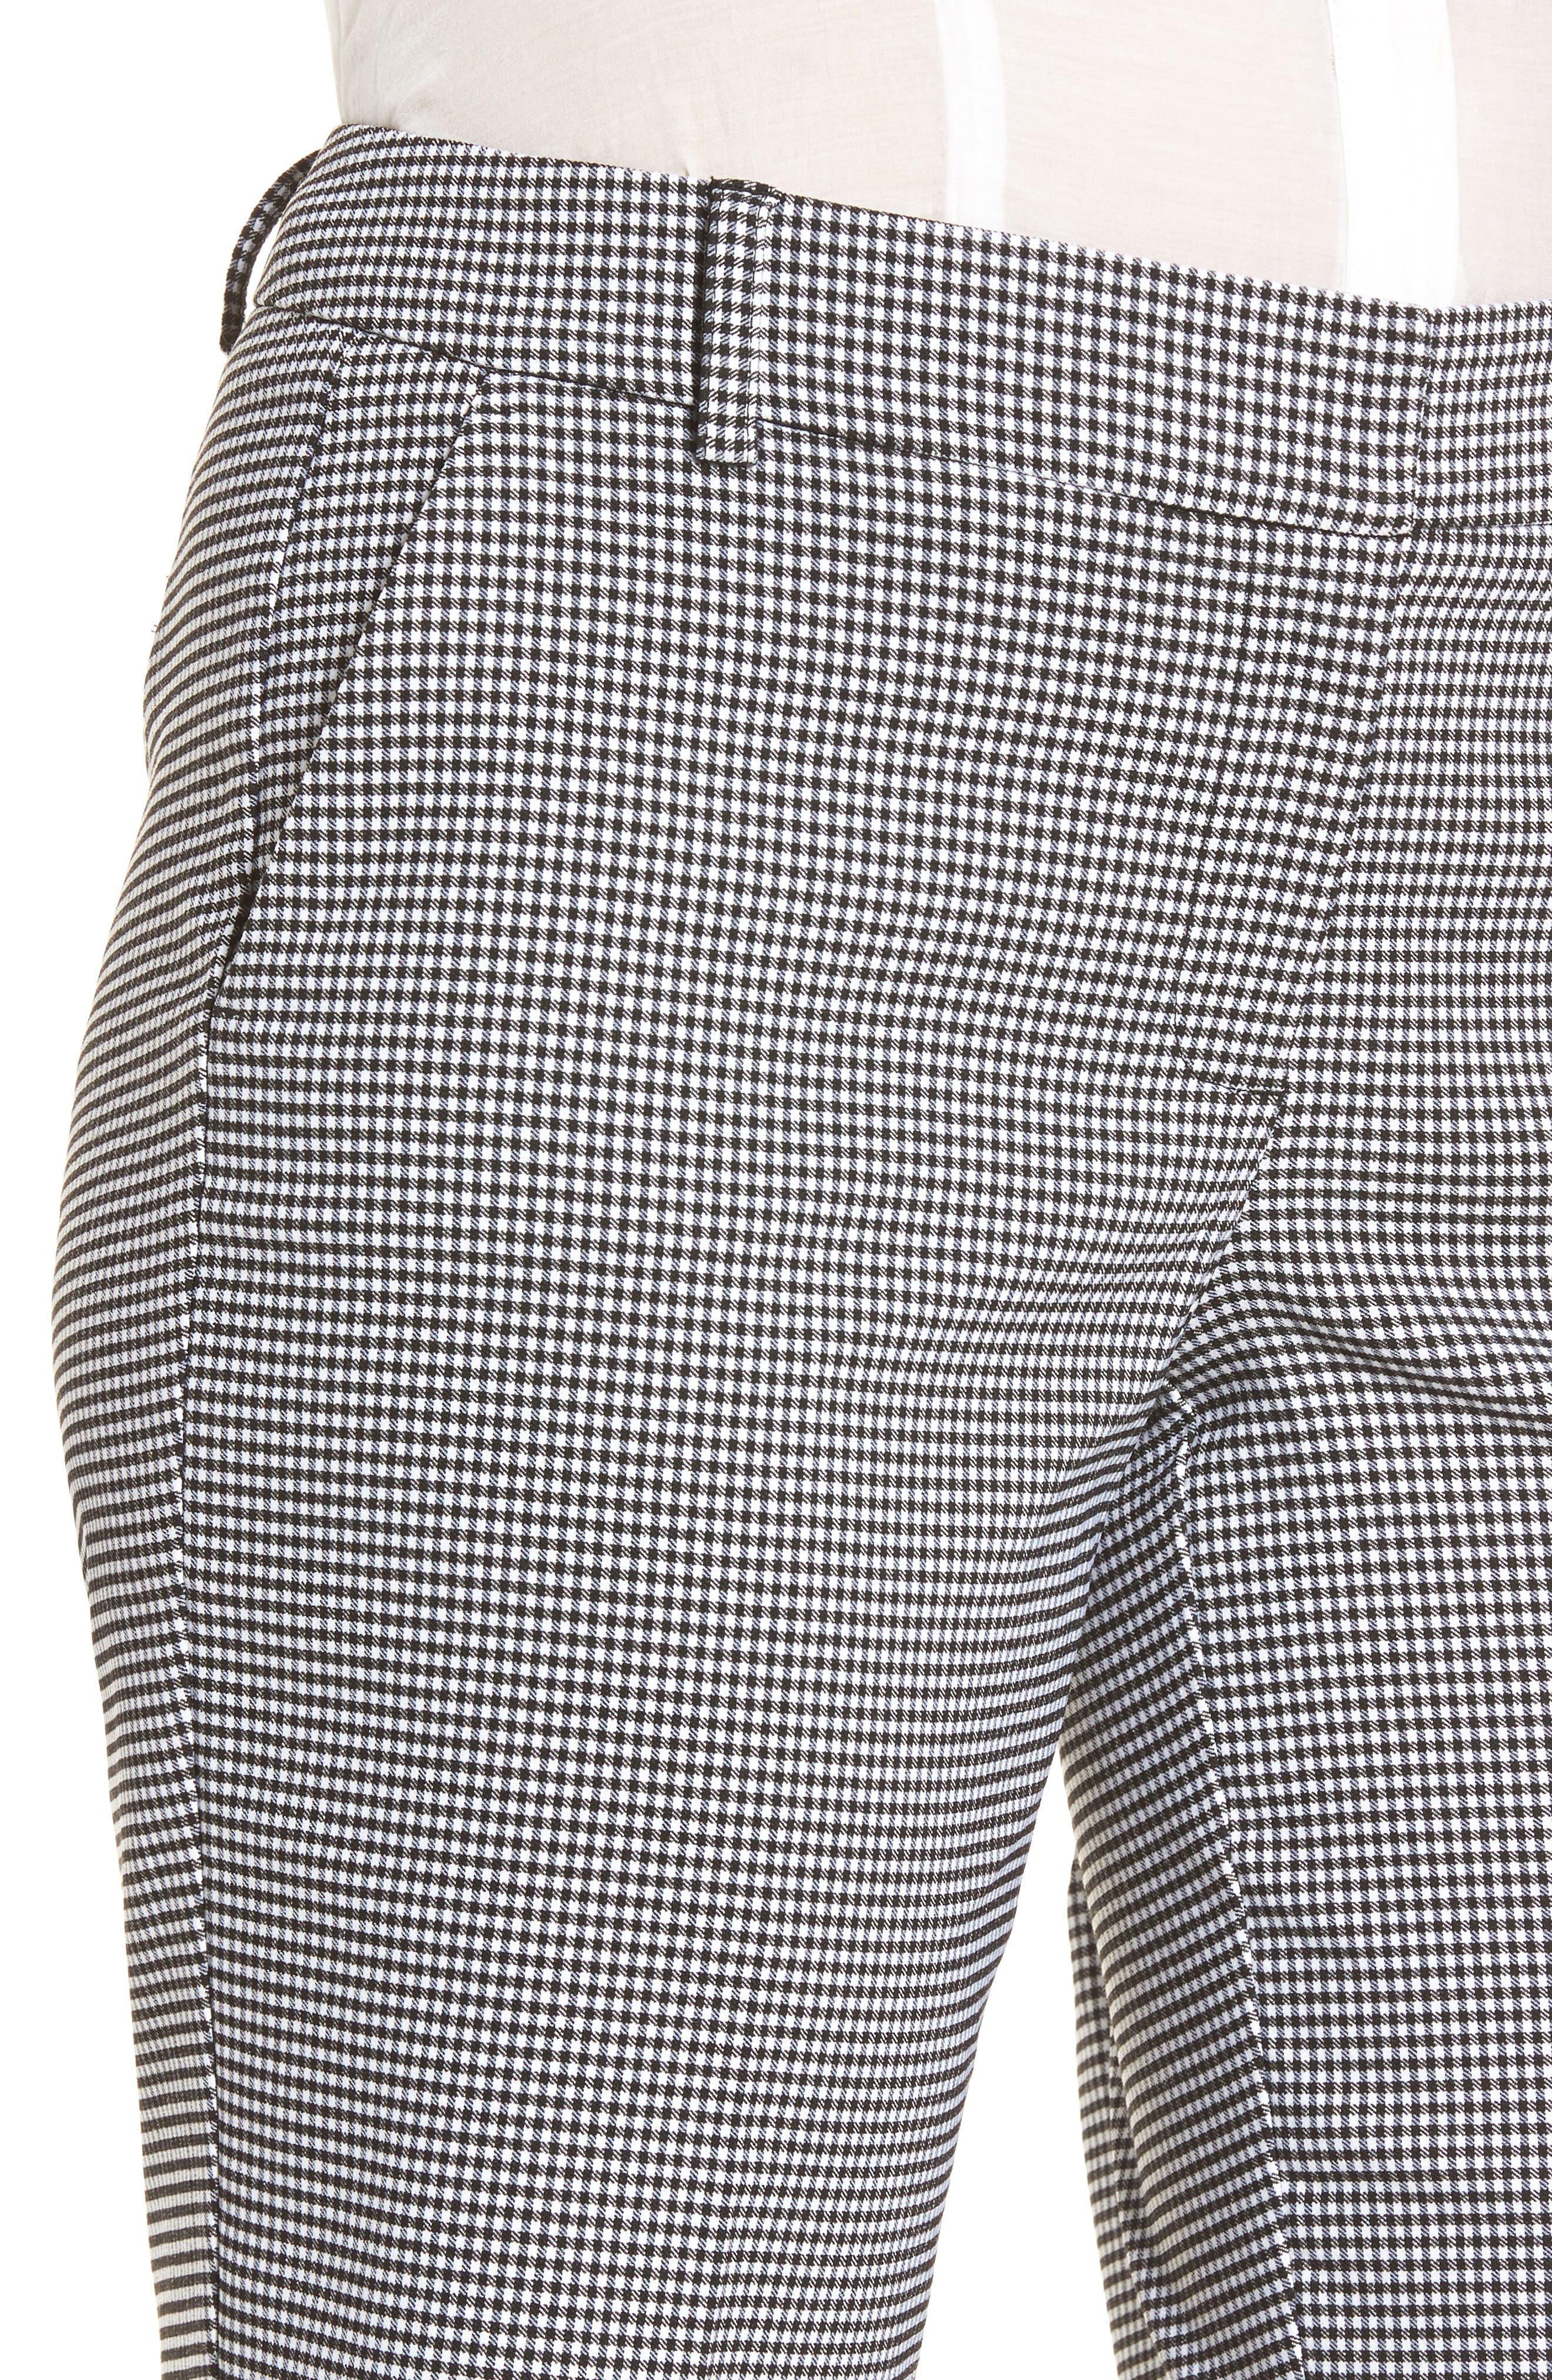 Stretch Bermuda Shorts,                             Alternate thumbnail 4, color,                             Black- White Gingham